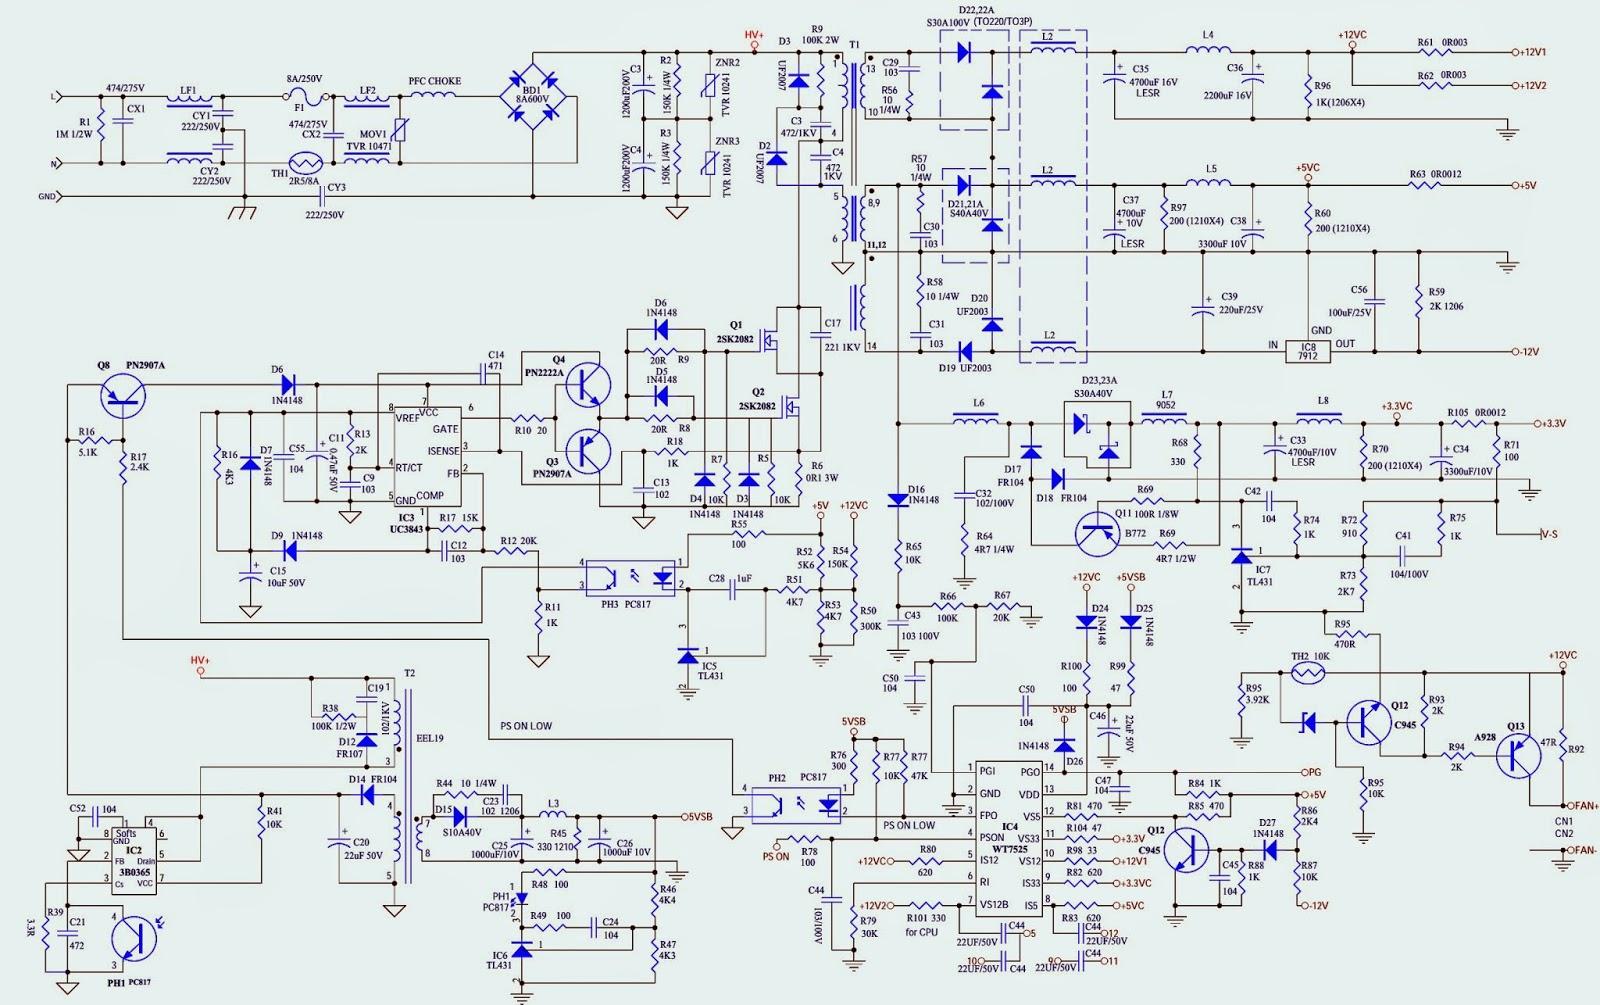 desktop atx power supply schematics utiek atx600t. Black Bedroom Furniture Sets. Home Design Ideas